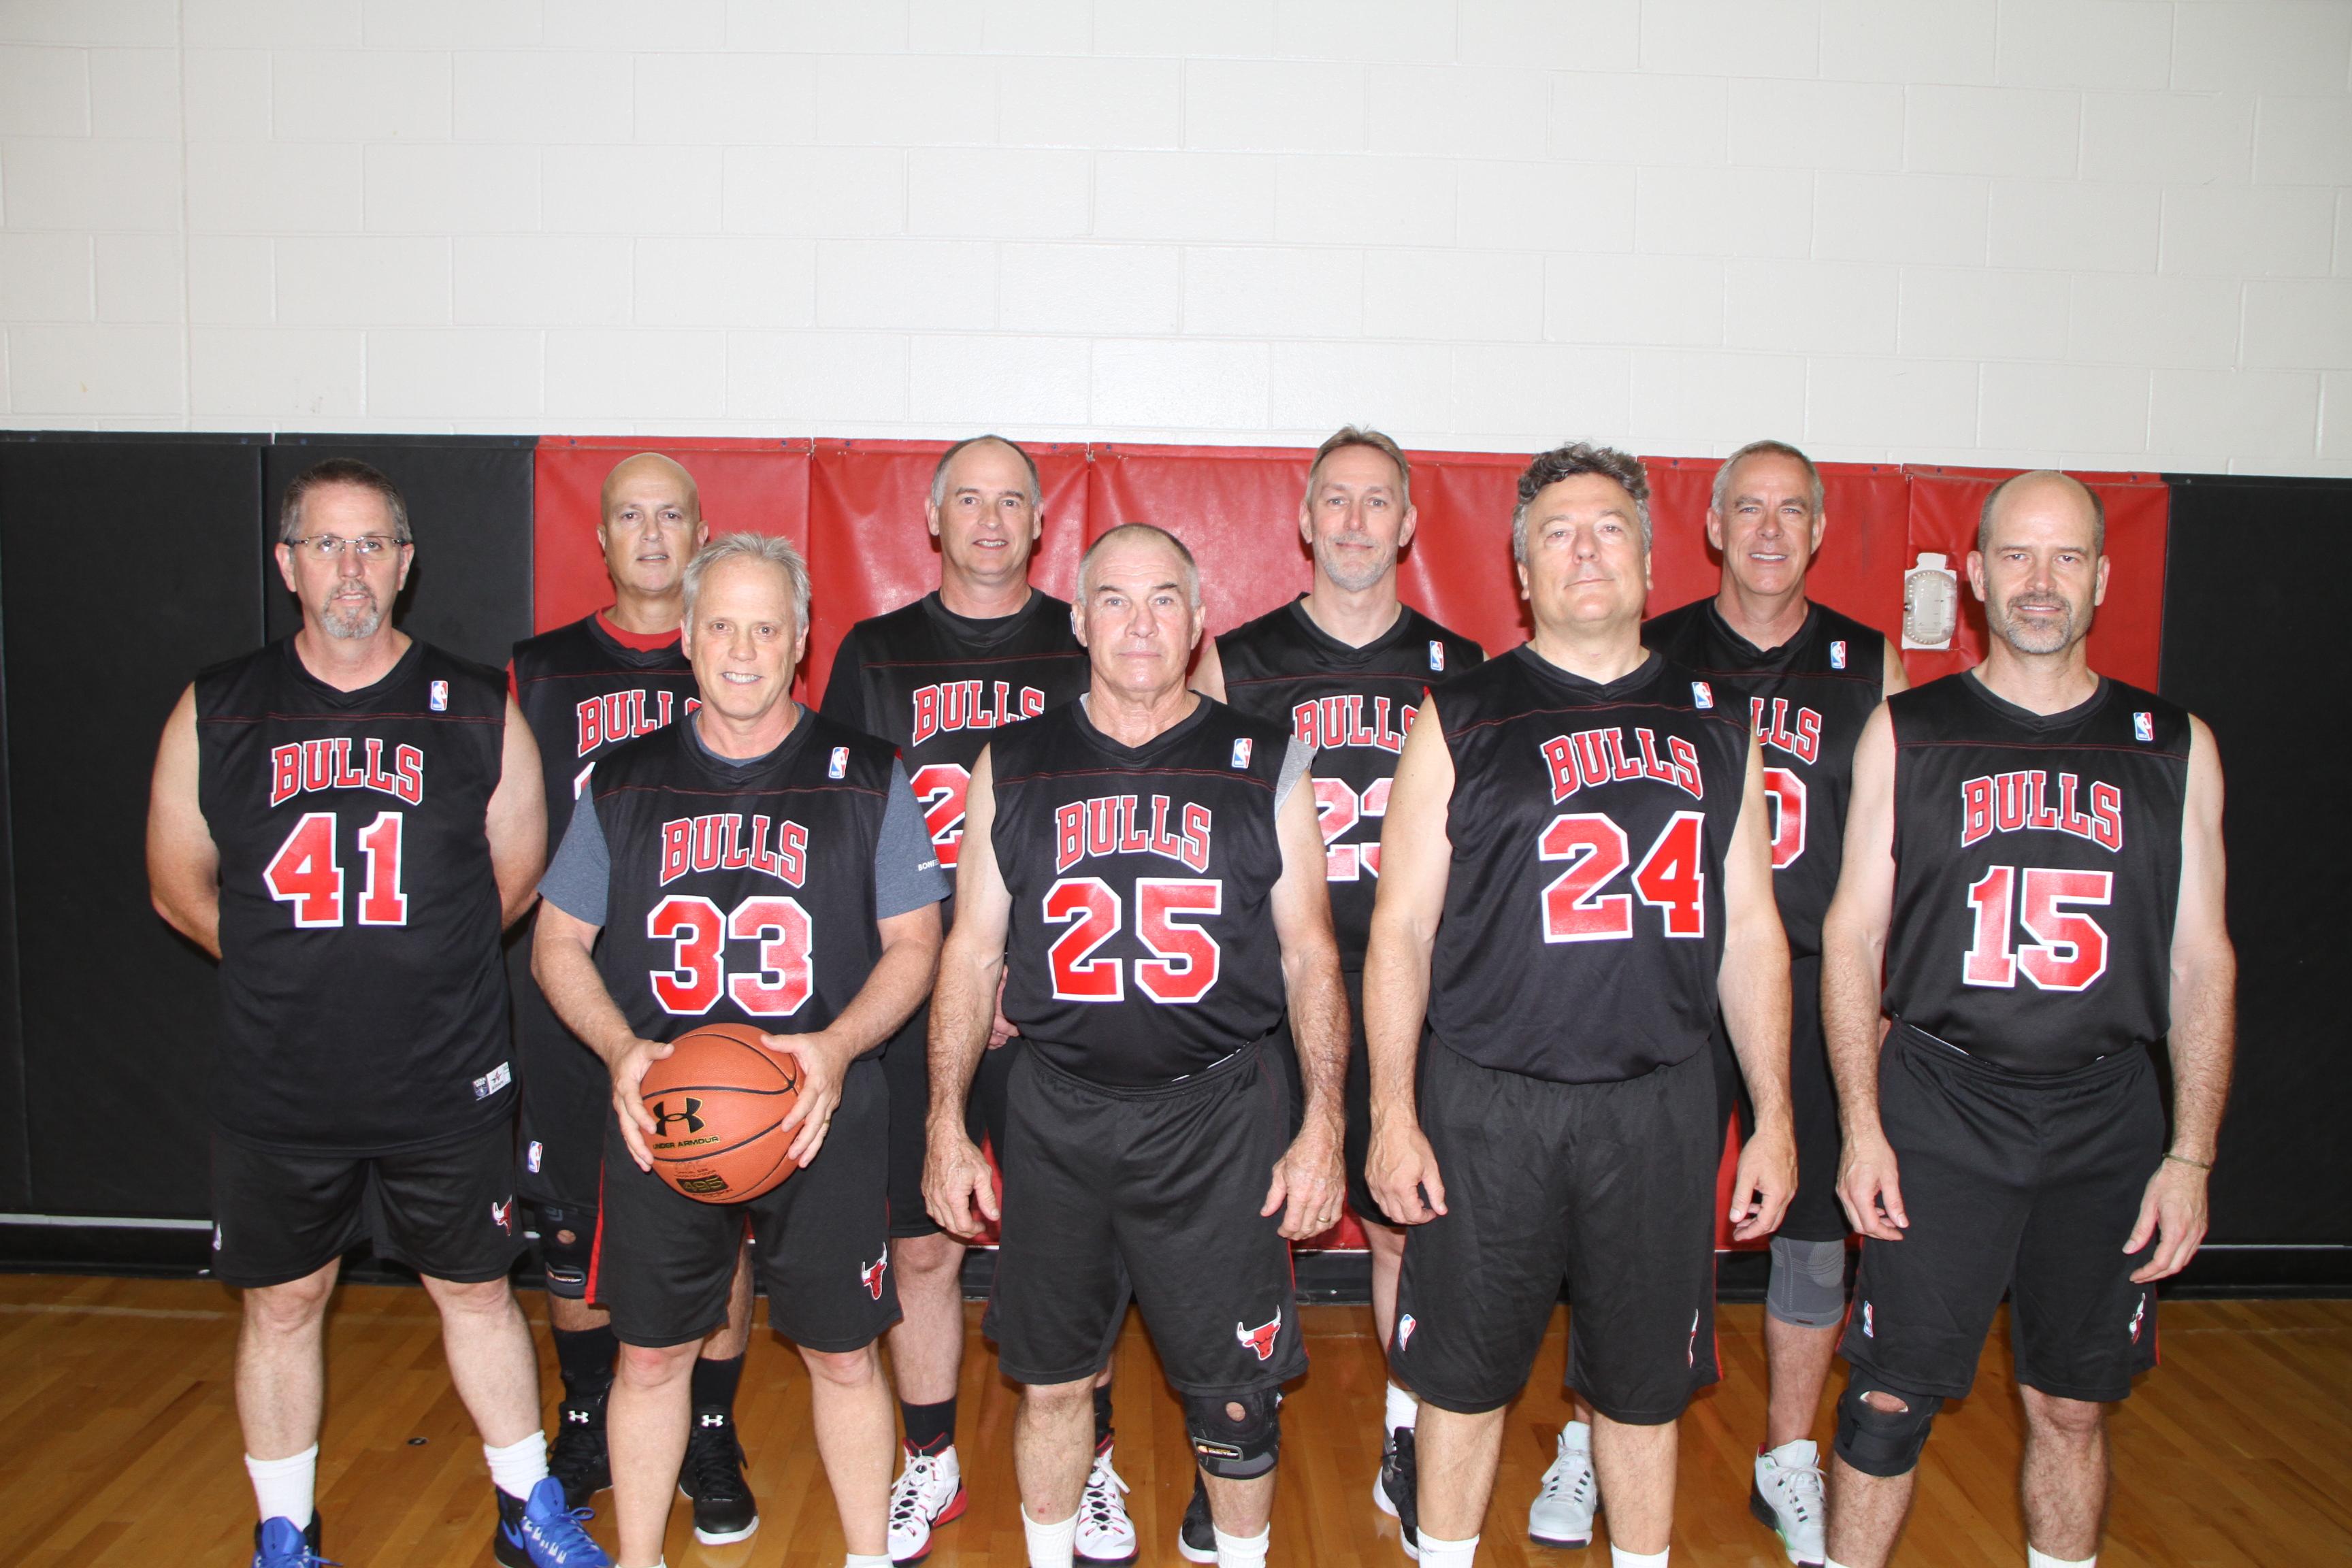 2016 Bulls